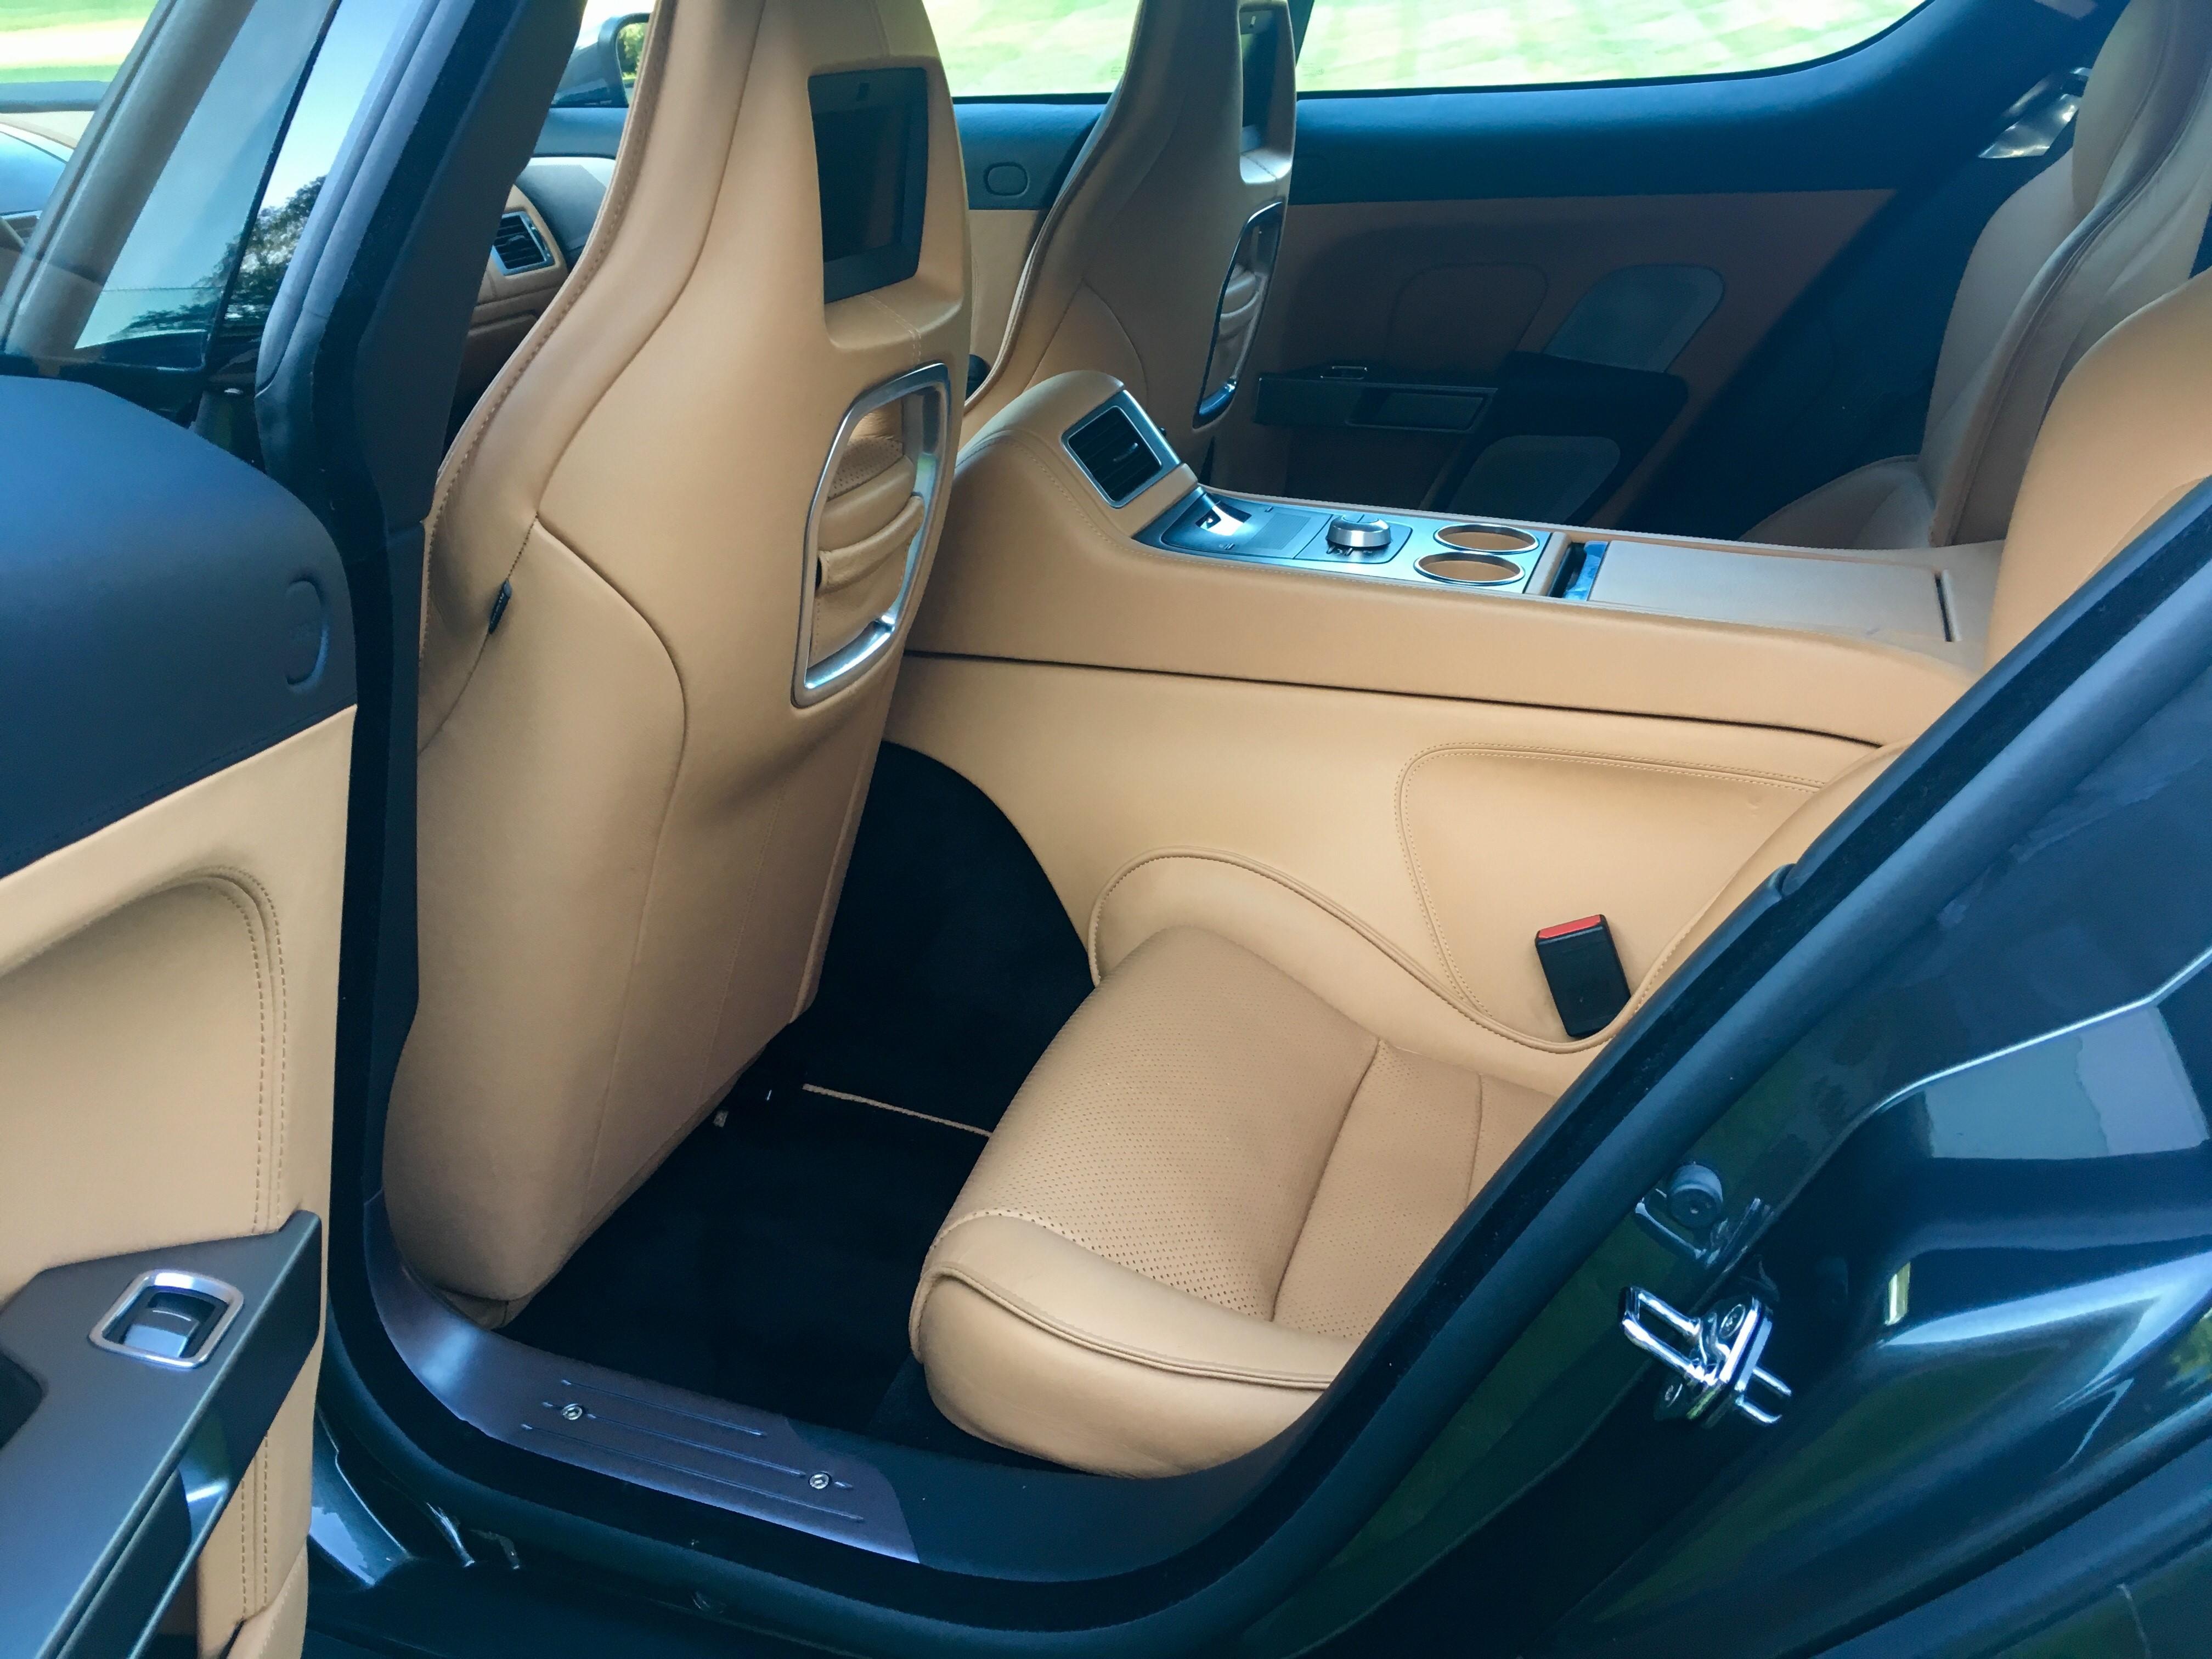 Interior Back Driver's Side